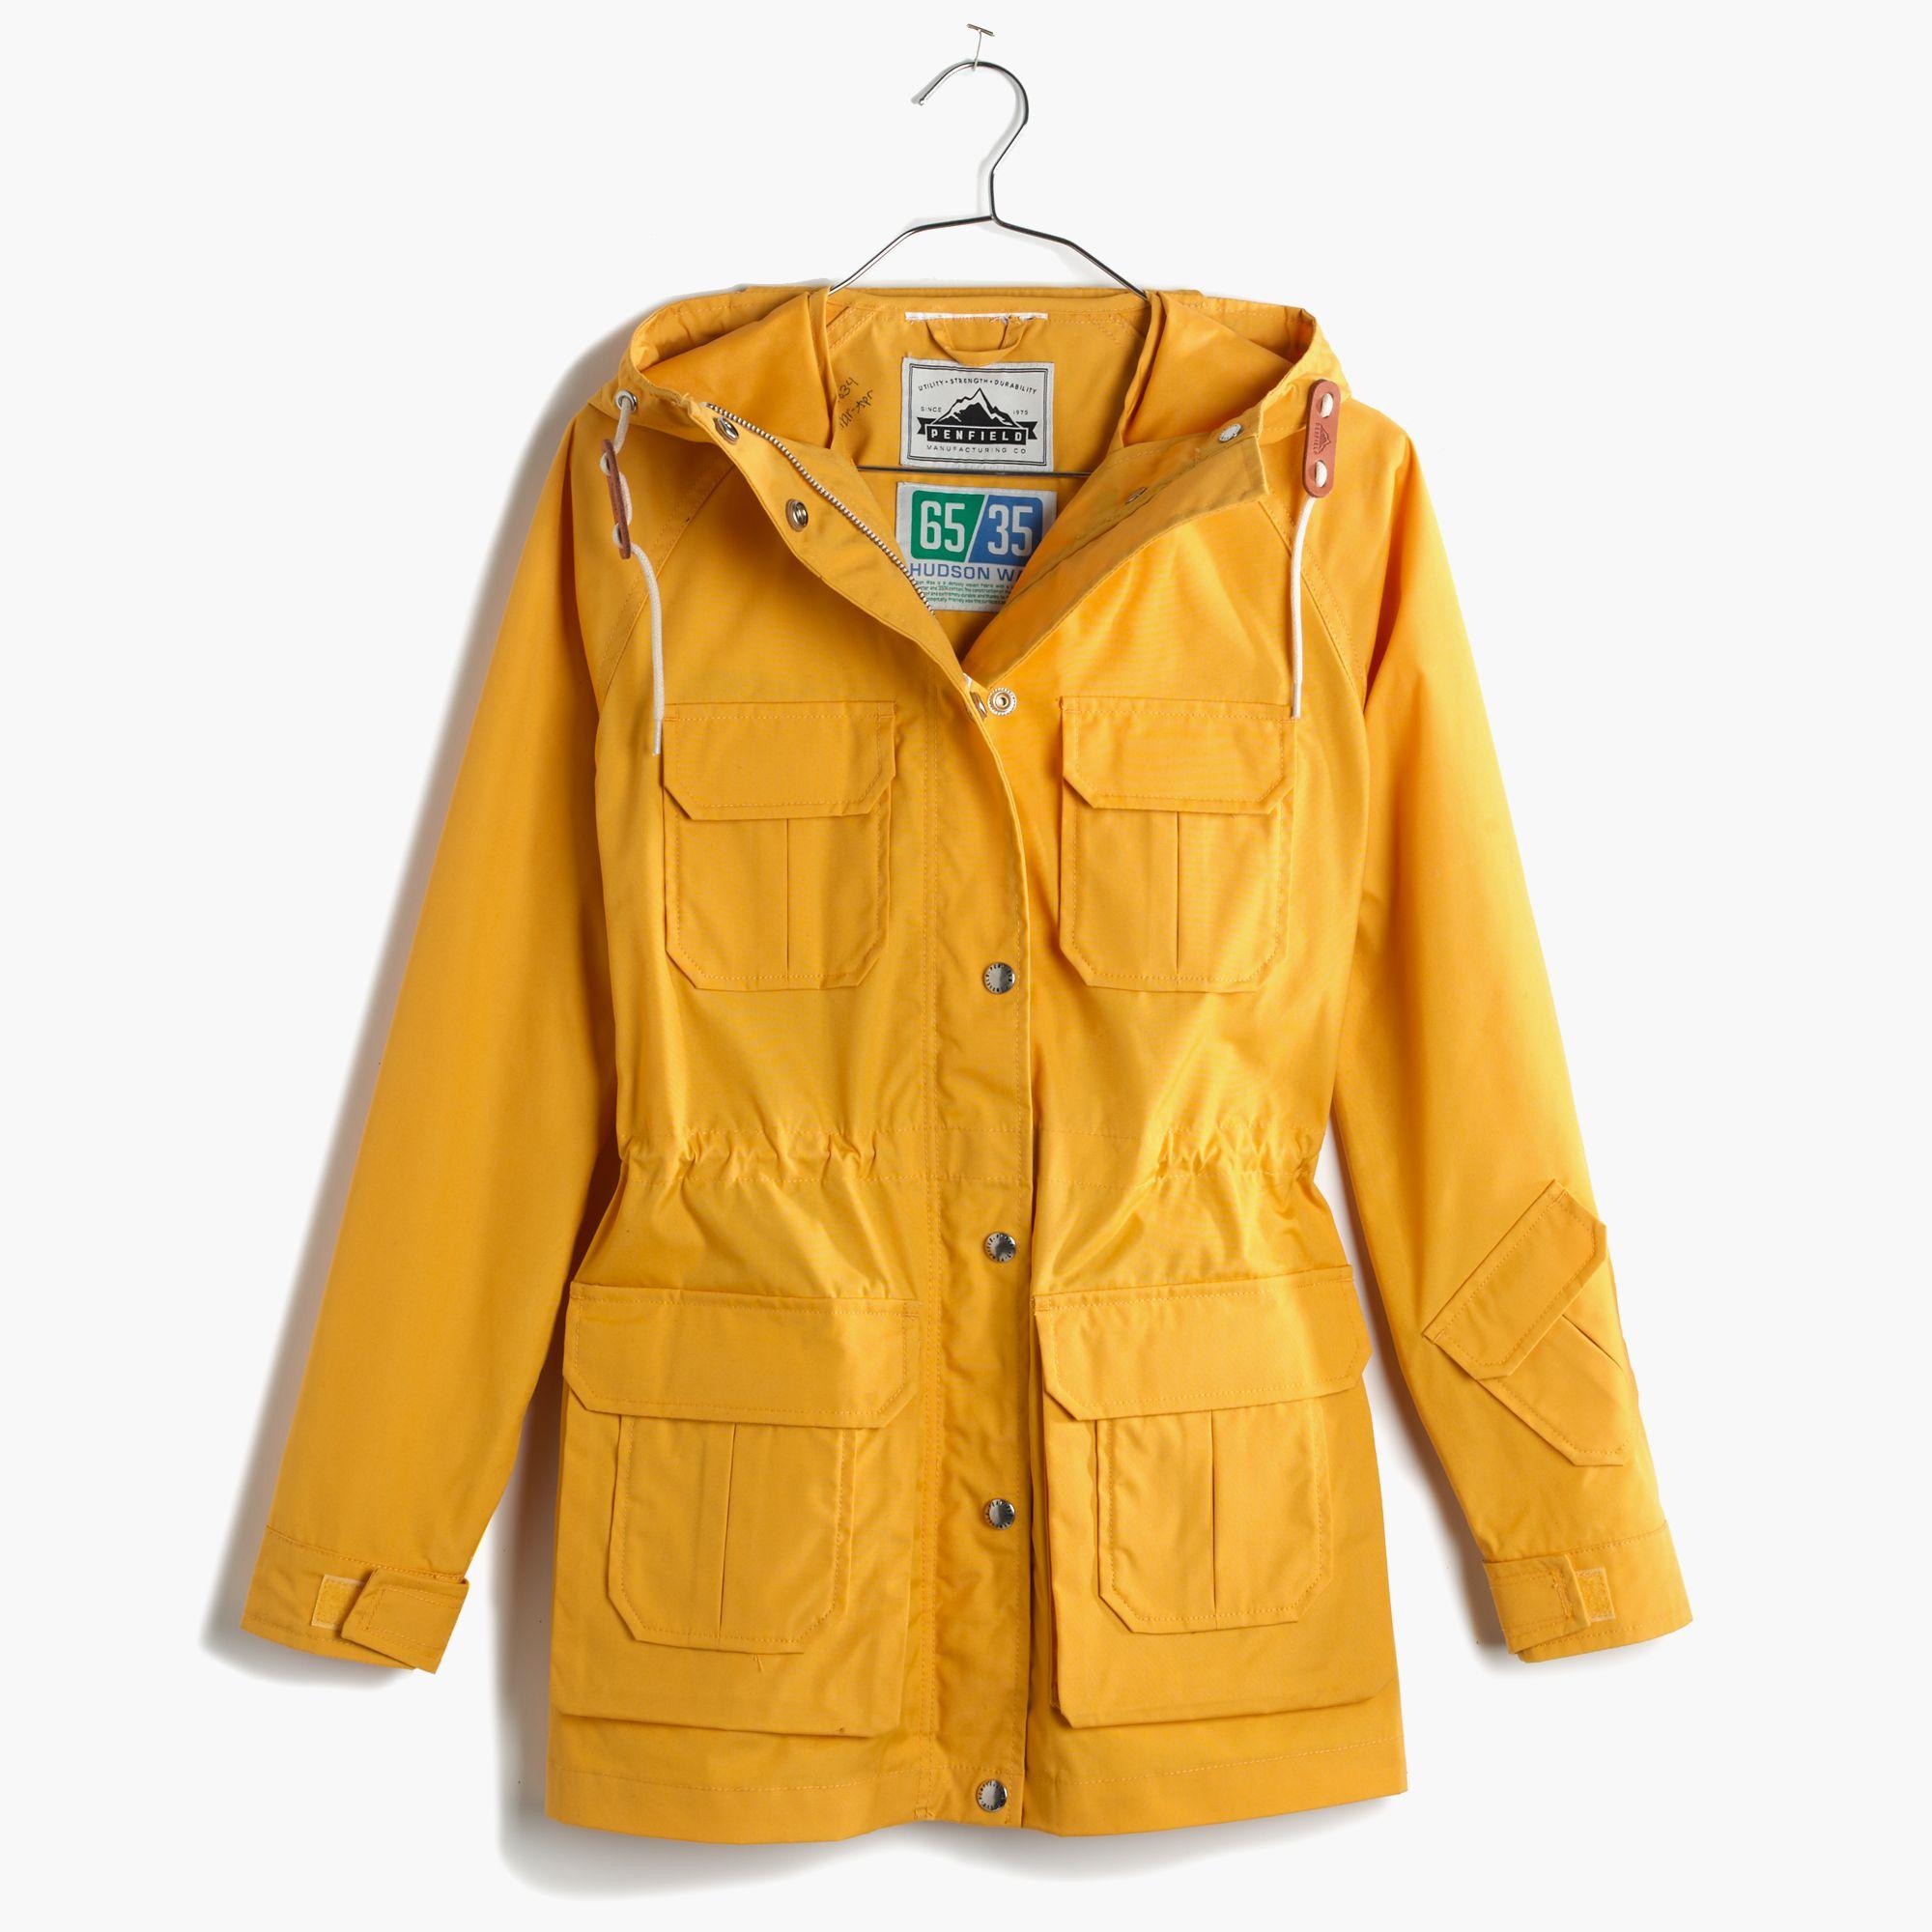 Madewell Penfield® Vassan Parka Jacket in Yellow | Lyst